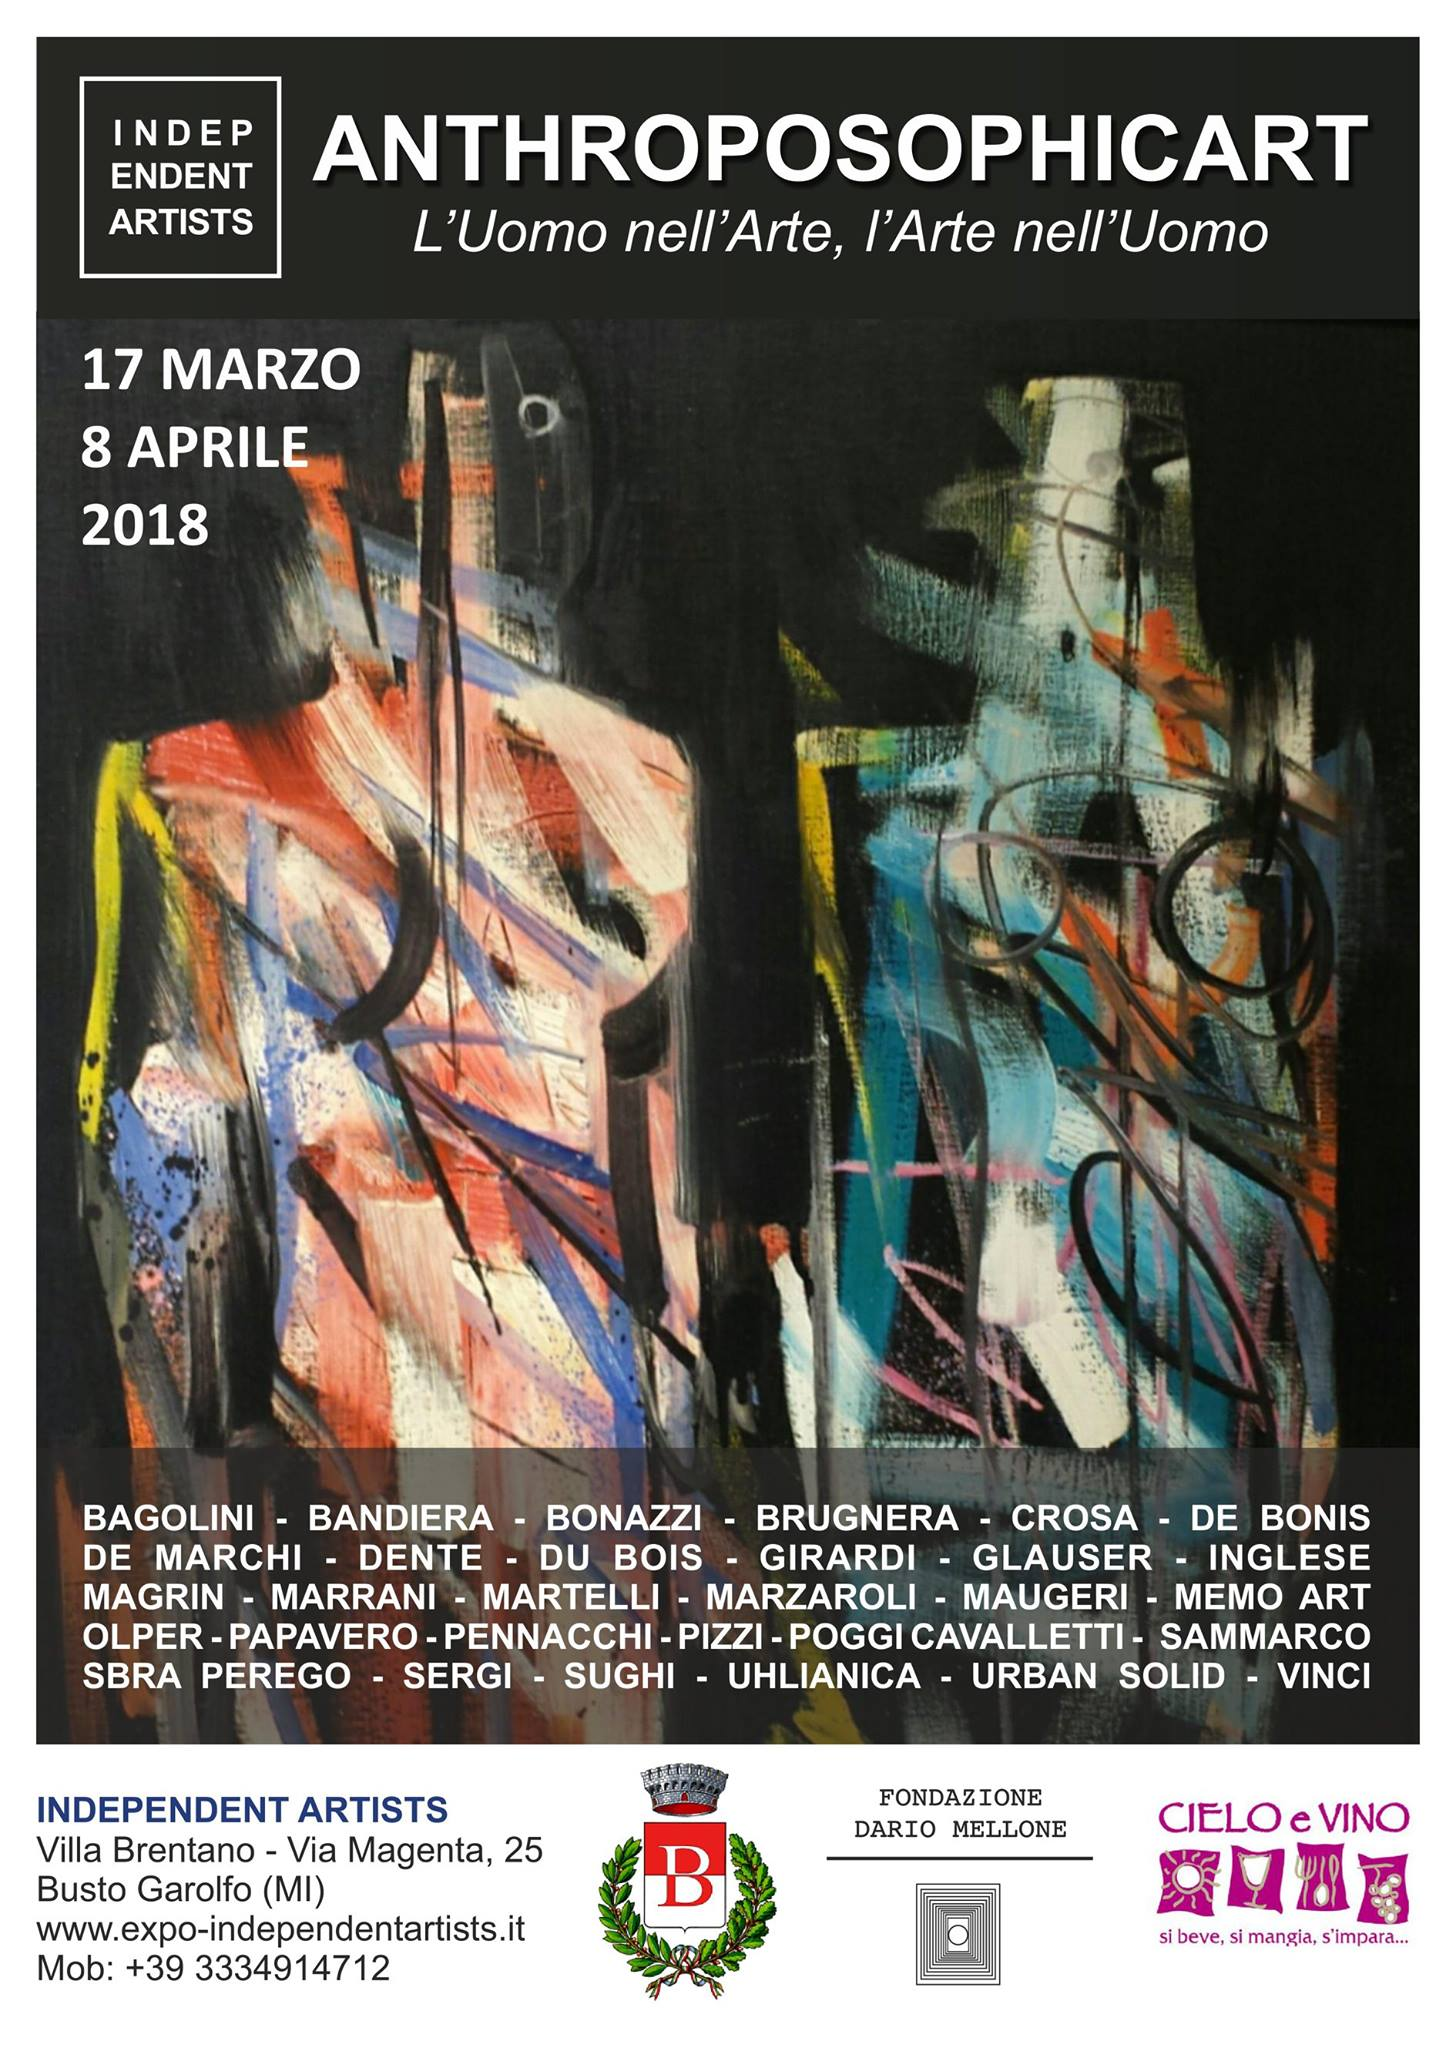 Mostra Anthroposophicart - Villa Brentano